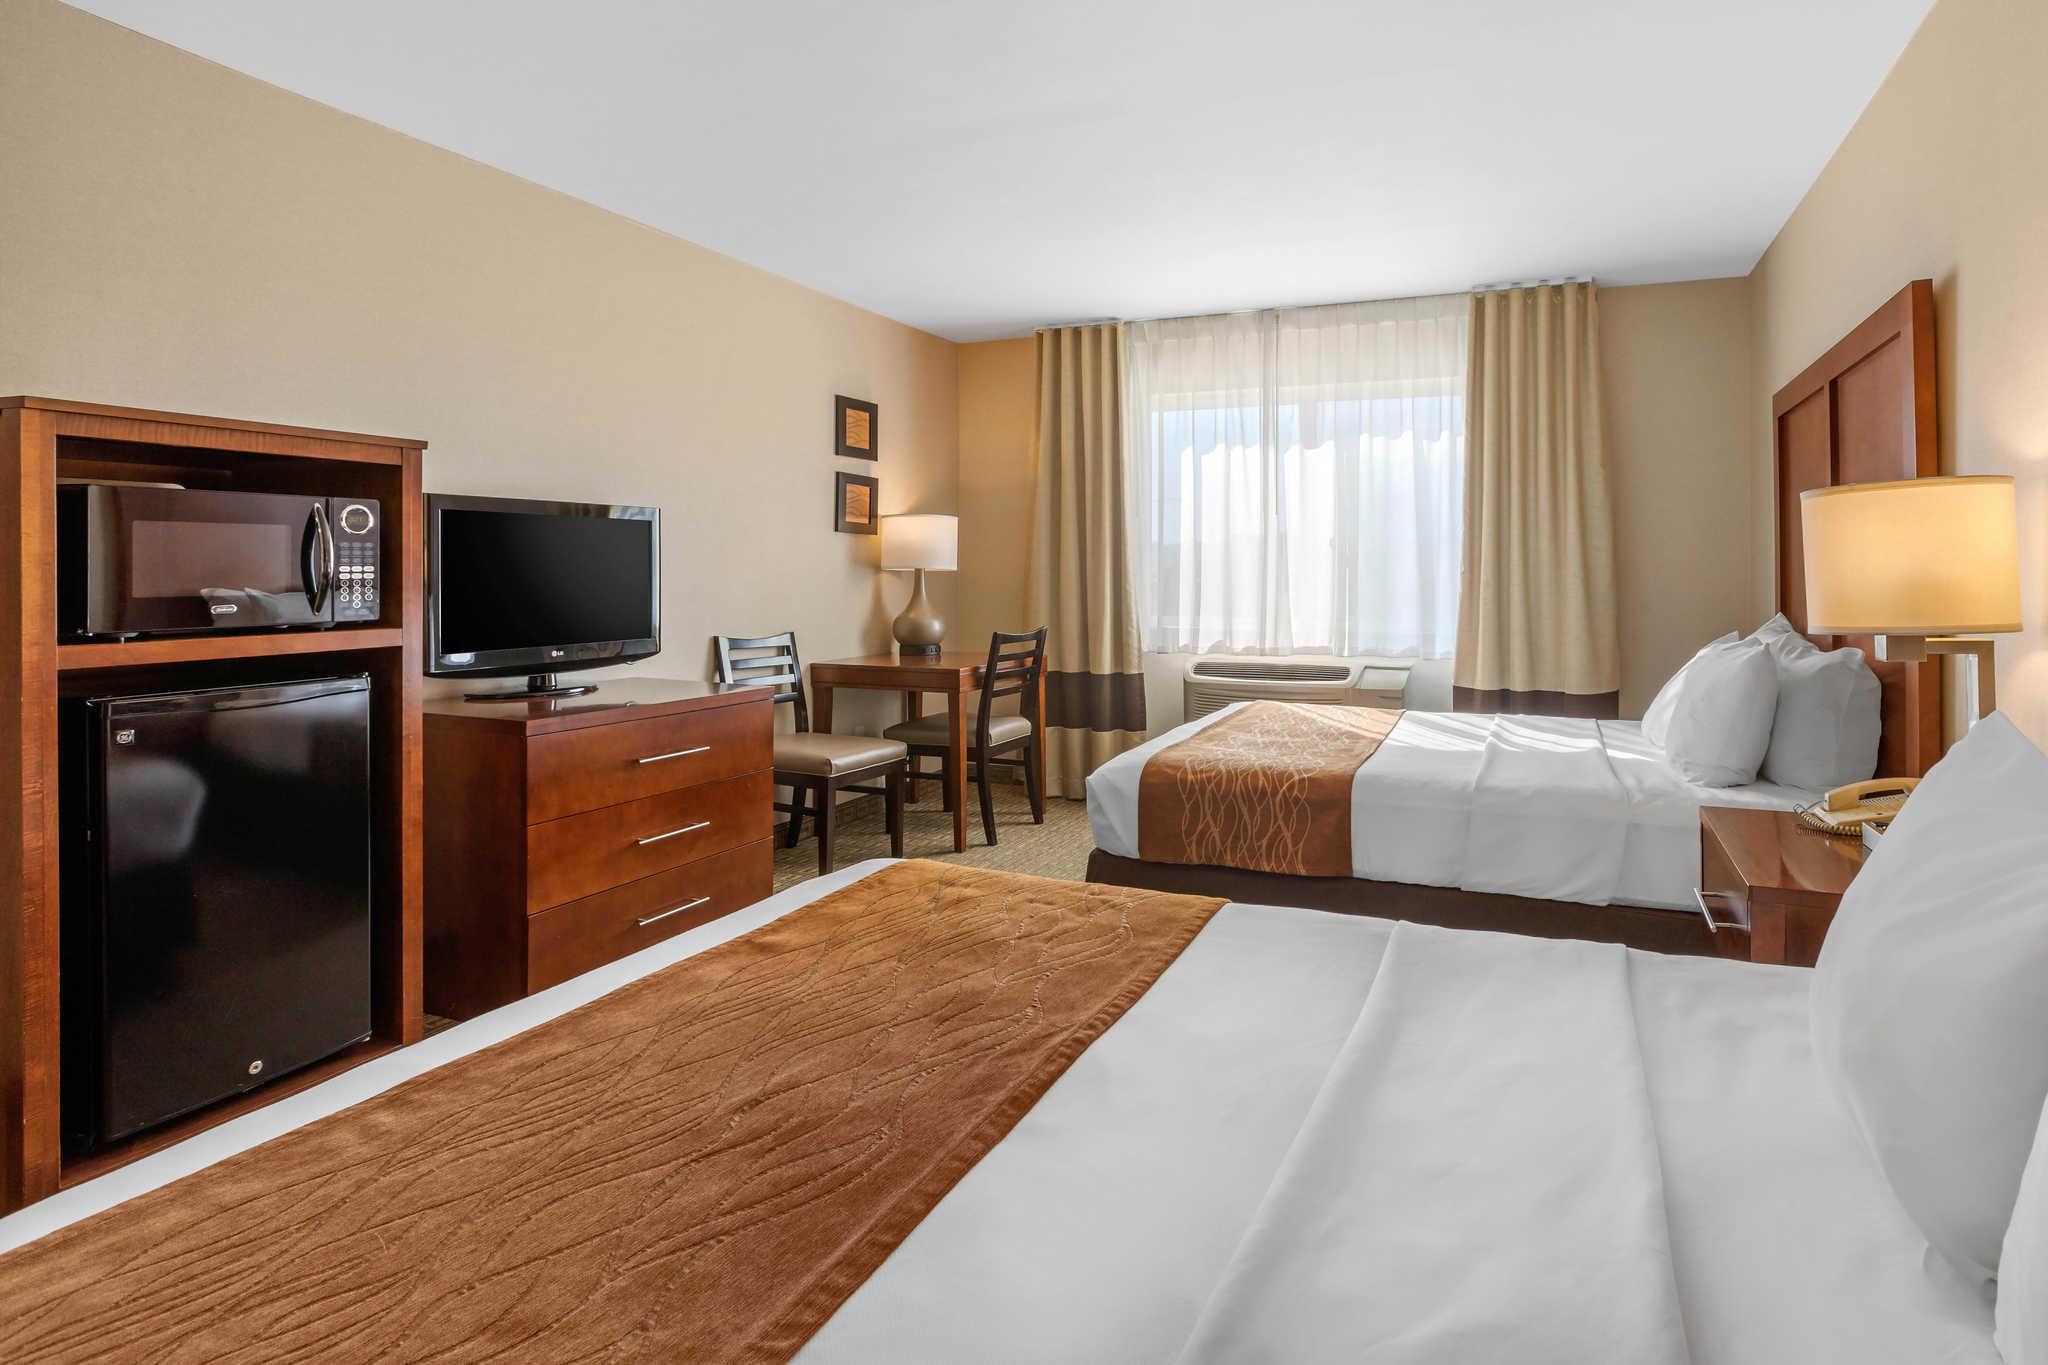 Comfort Inn & Suites Murrieta Temecula Wine Country image 15